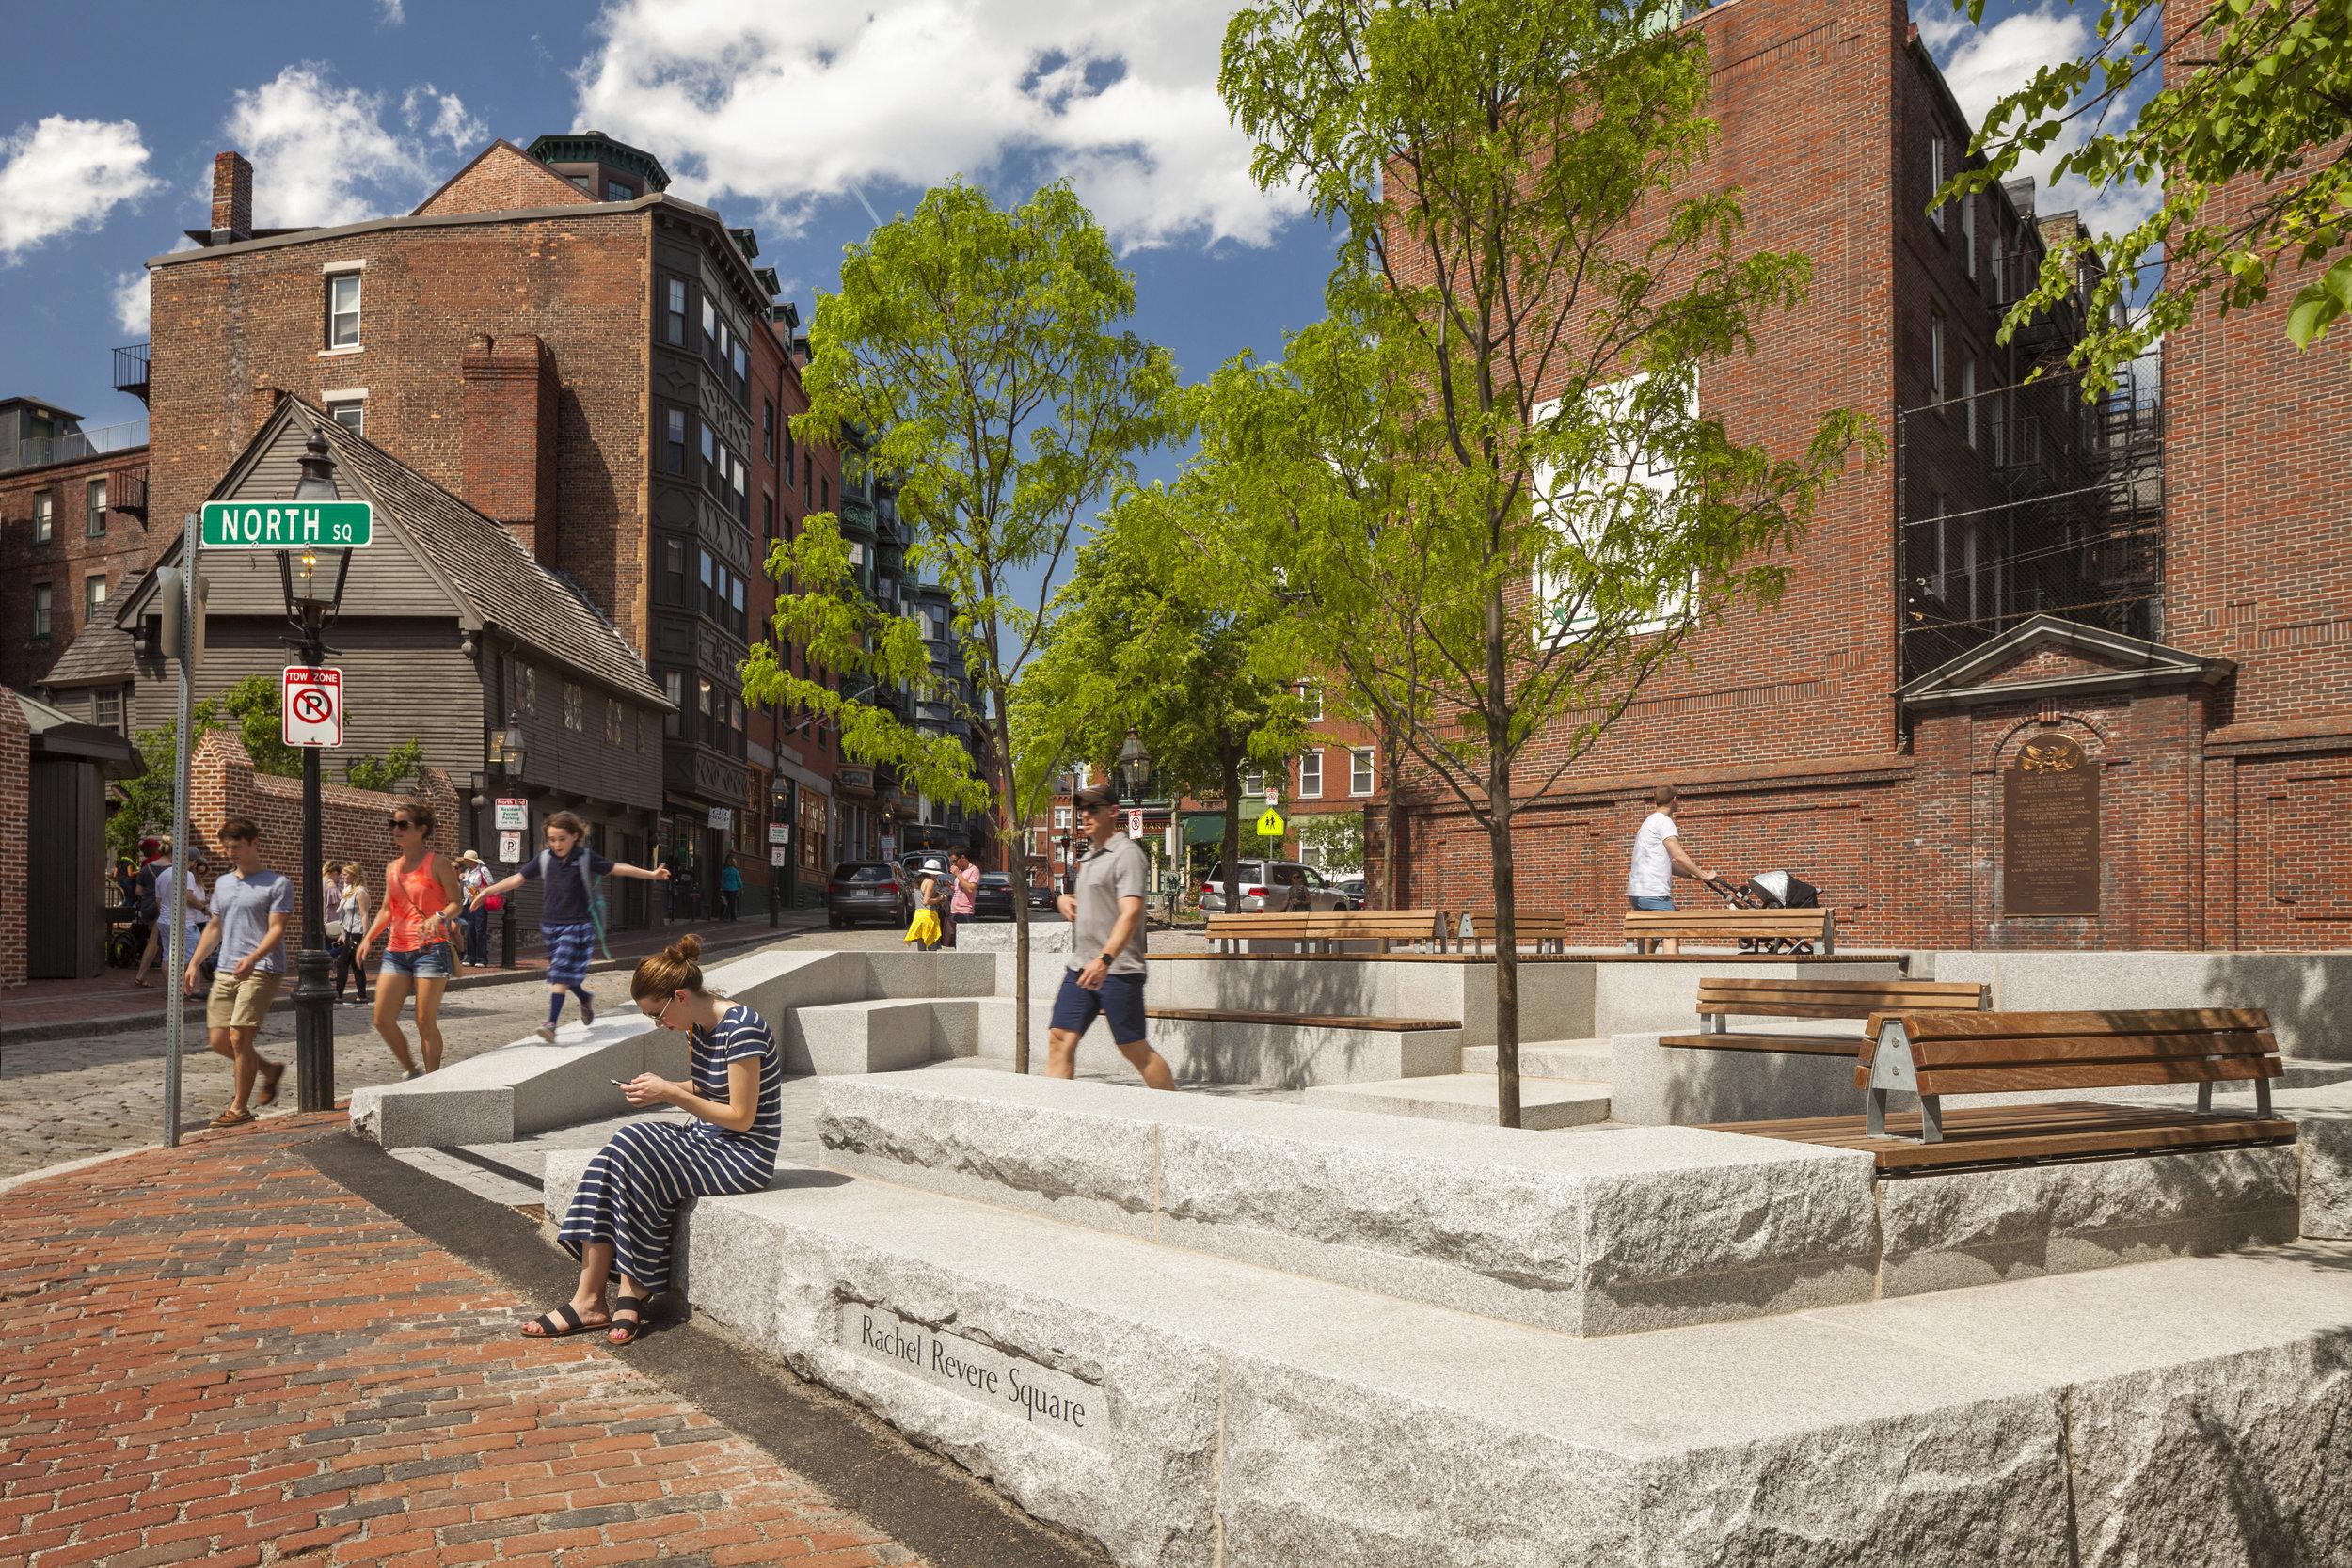 Rachel Revere Square, Boston, MA - Kyle Zick Landscape Architecture